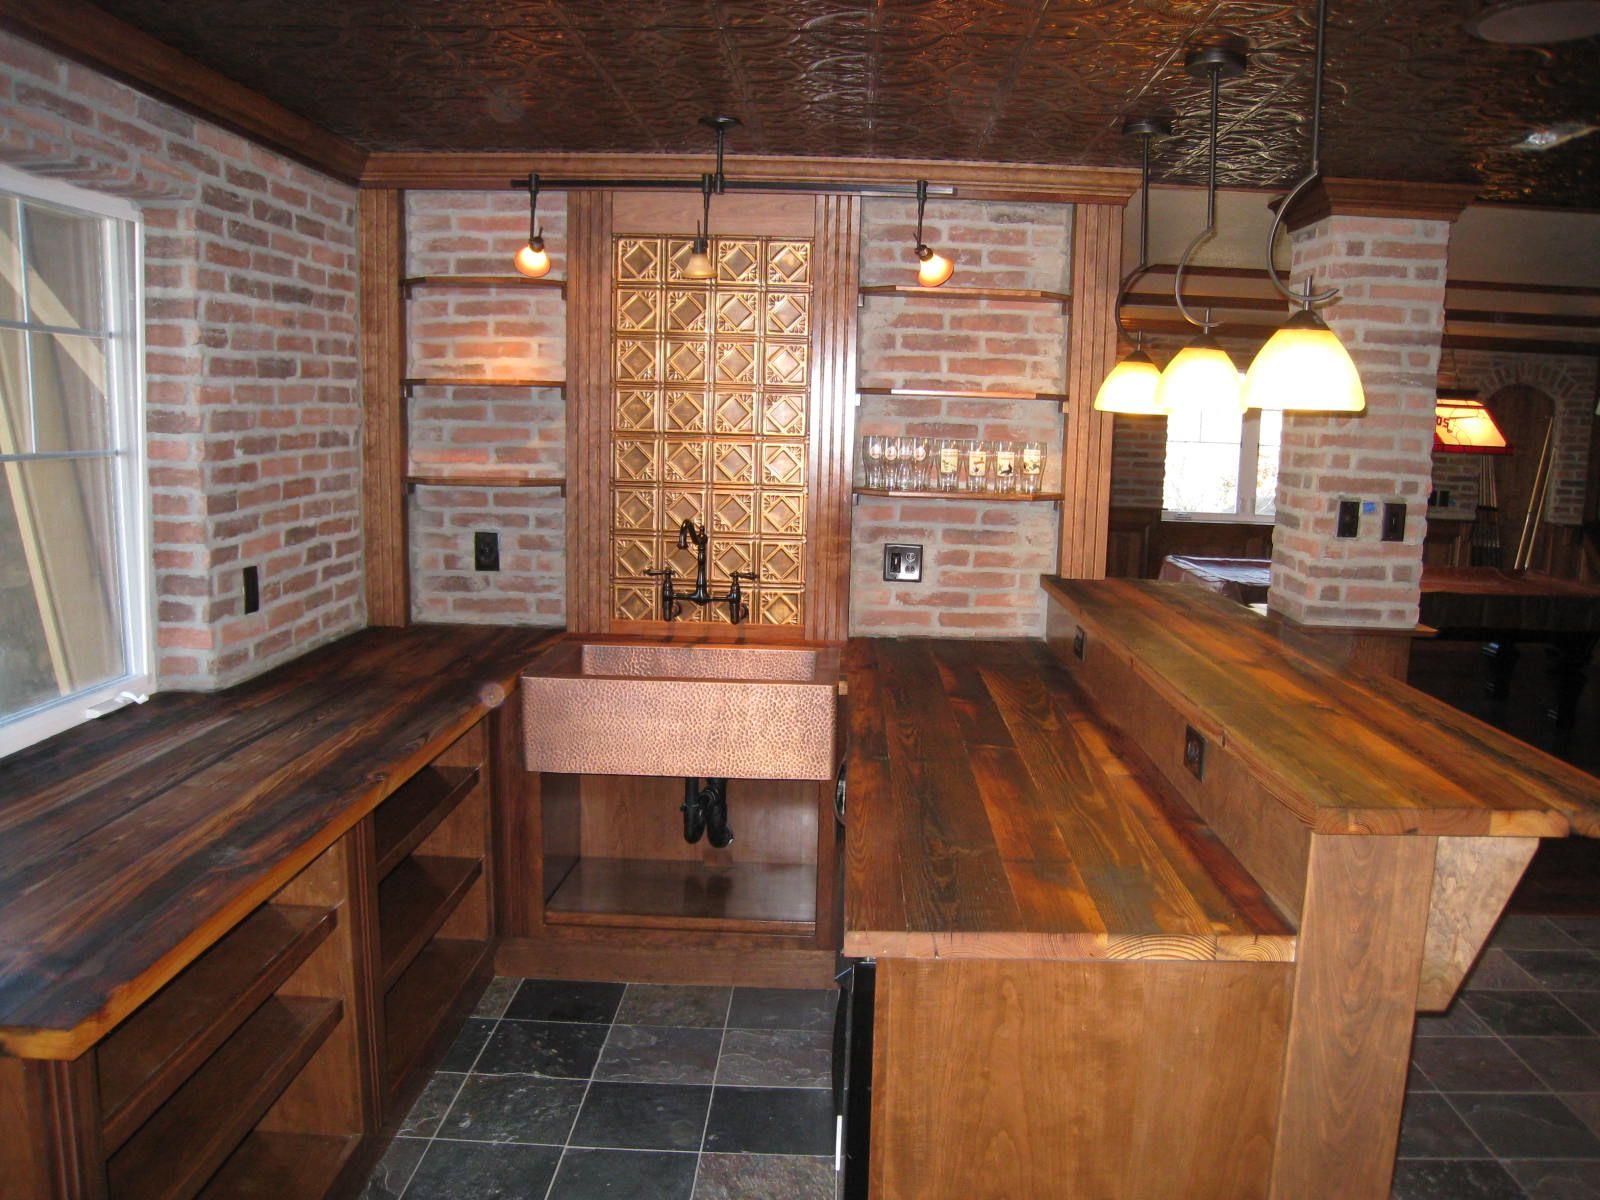 Basement Pub Beyond The Goal Was To Mimic A English Pub So We Designed A Wet Bar Pub Interior Home Pub Restaurant Interior